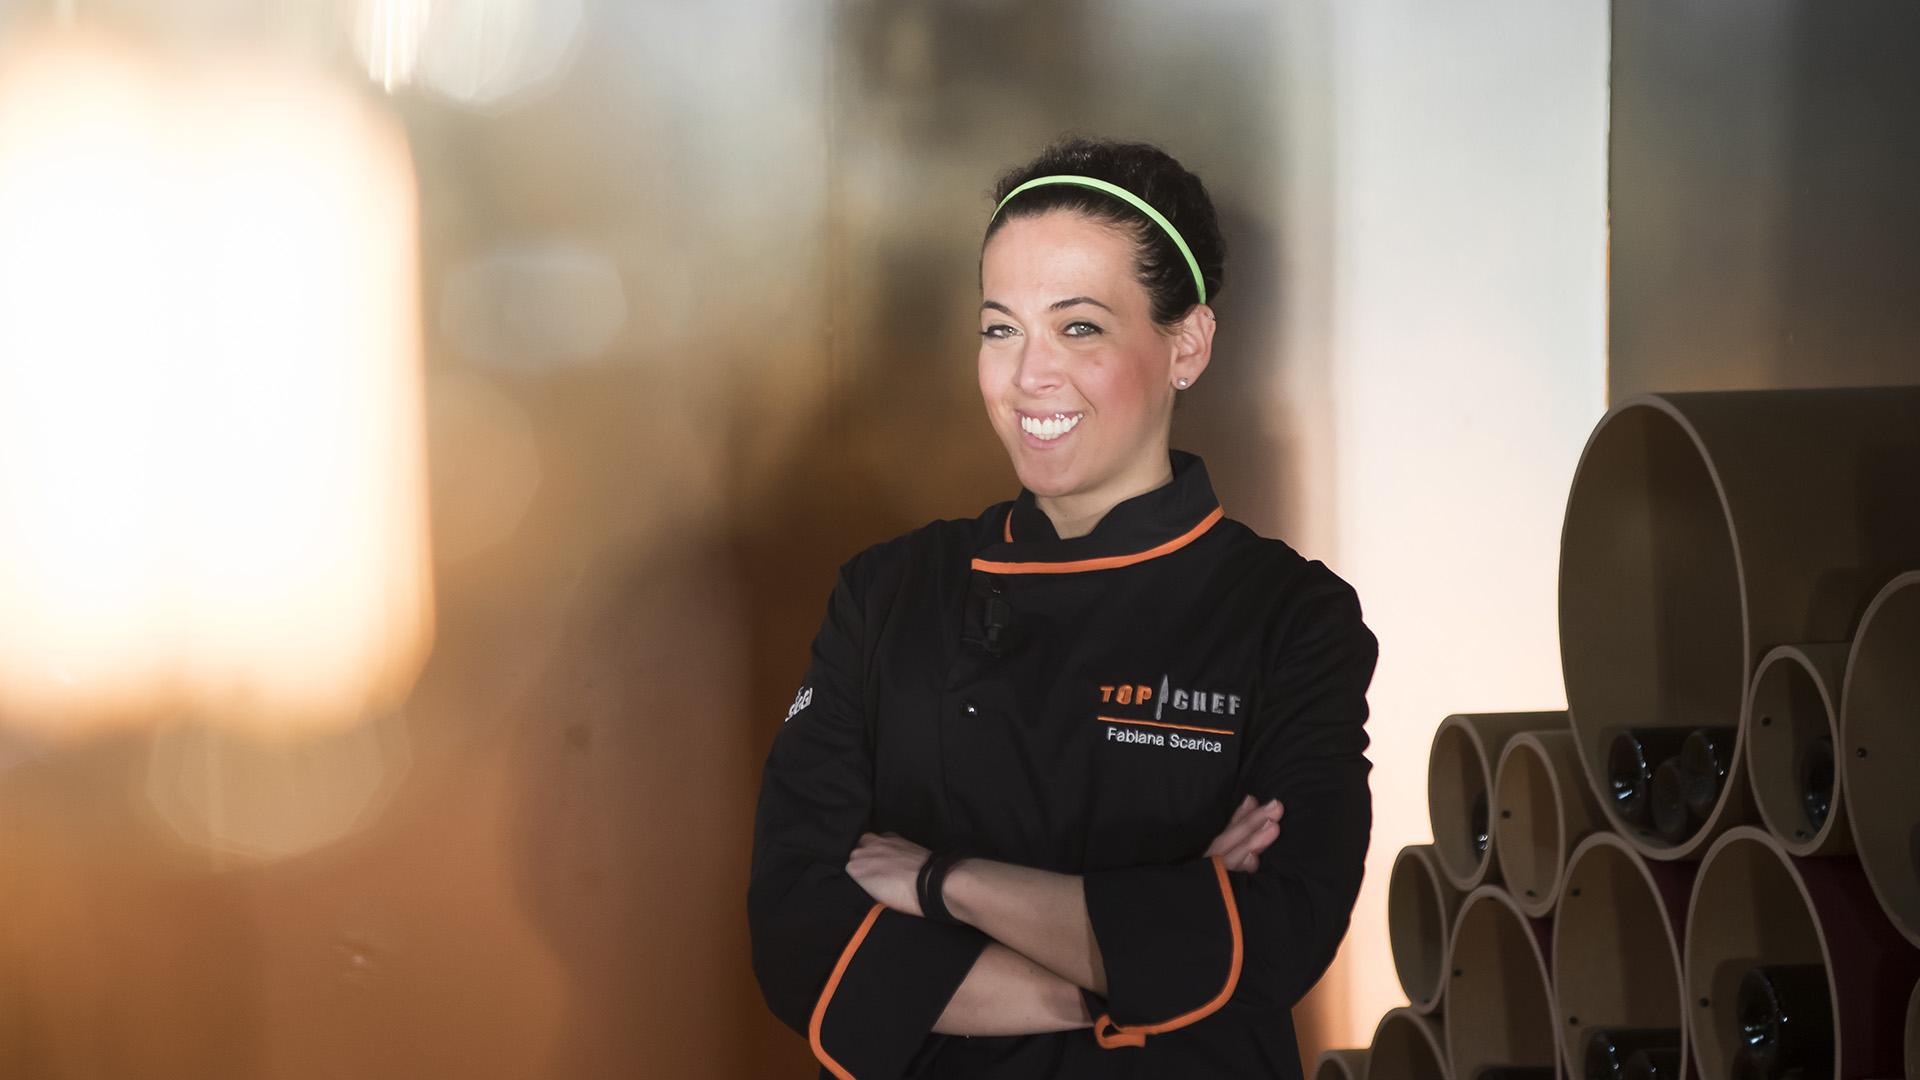 top chef fabiana